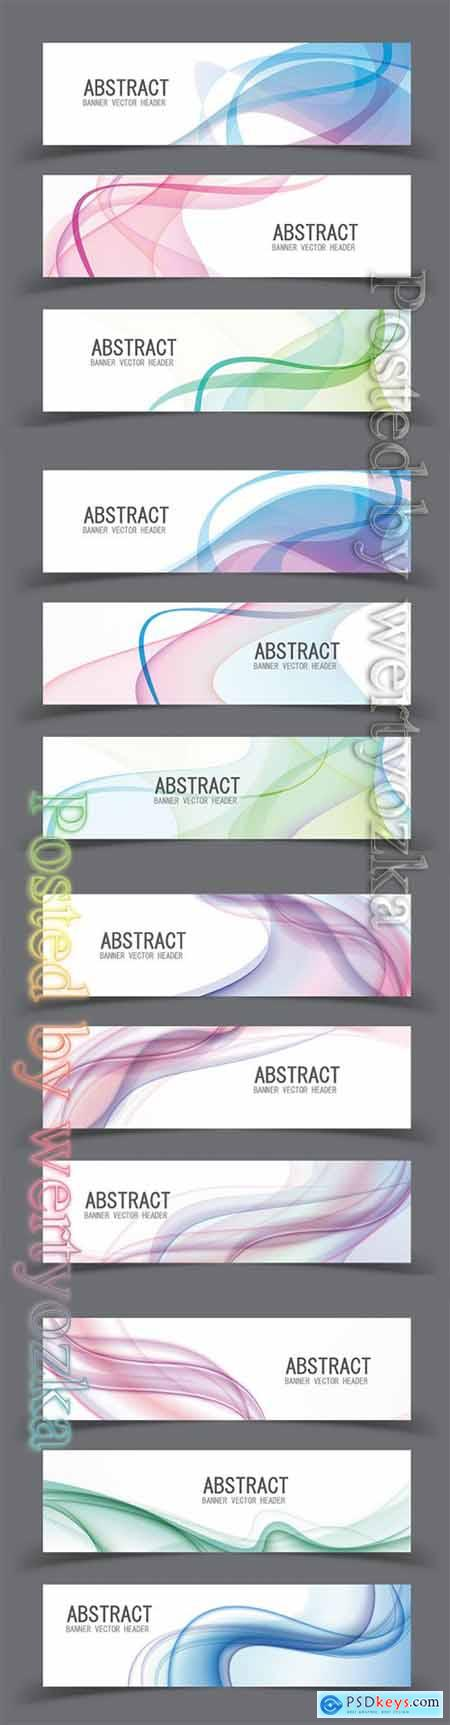 Vector abstract design banner template